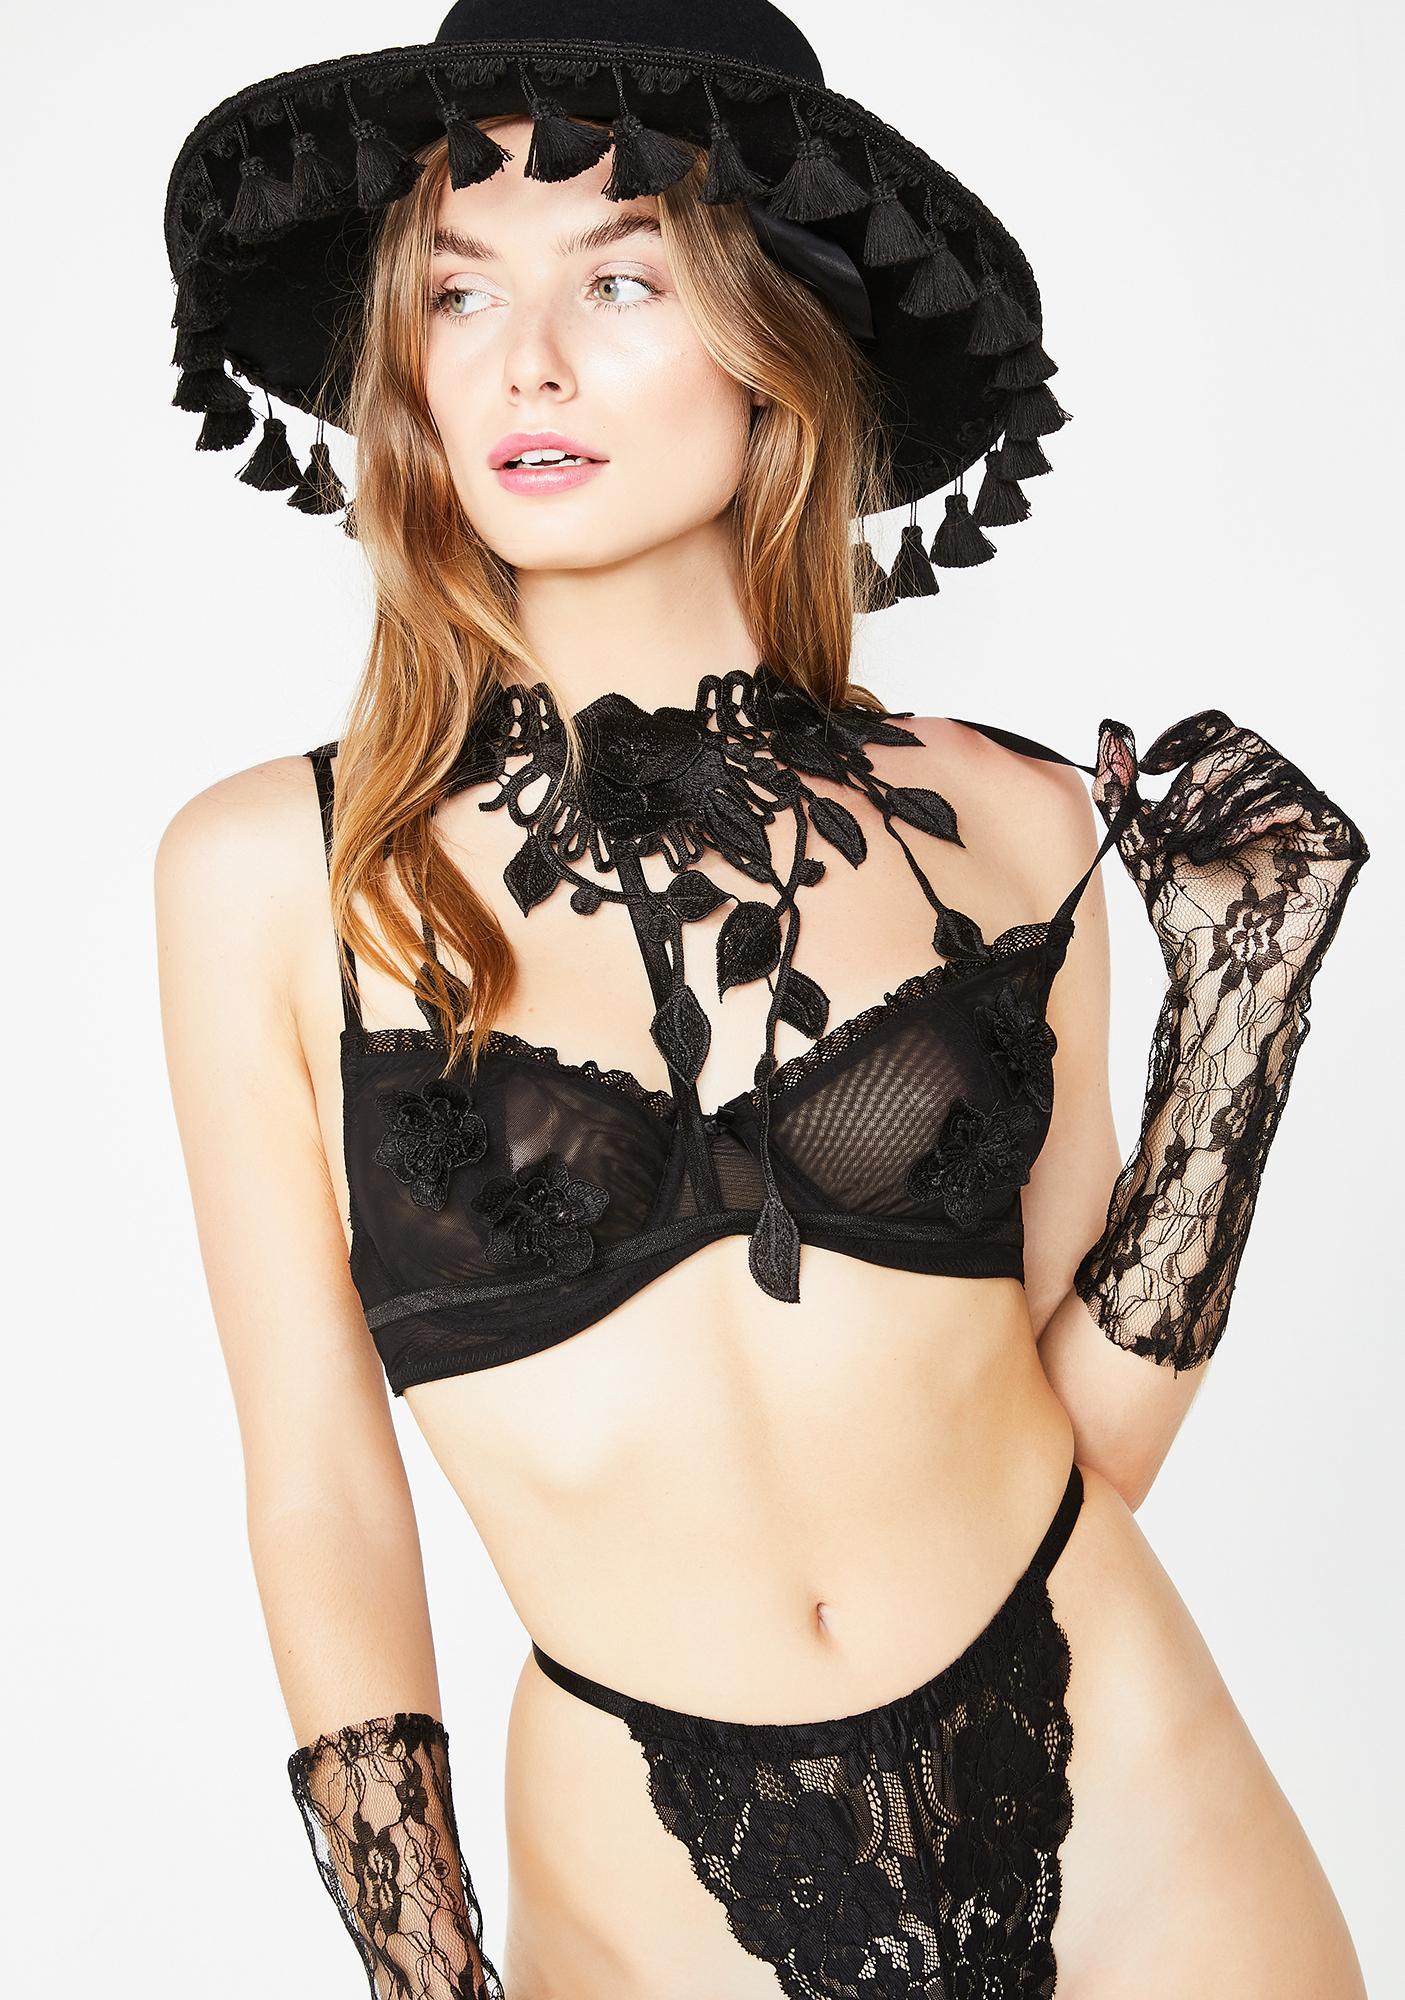 ... Sugar Thrillz Wicked Minx Floral Harness ... 1e1dd8b68